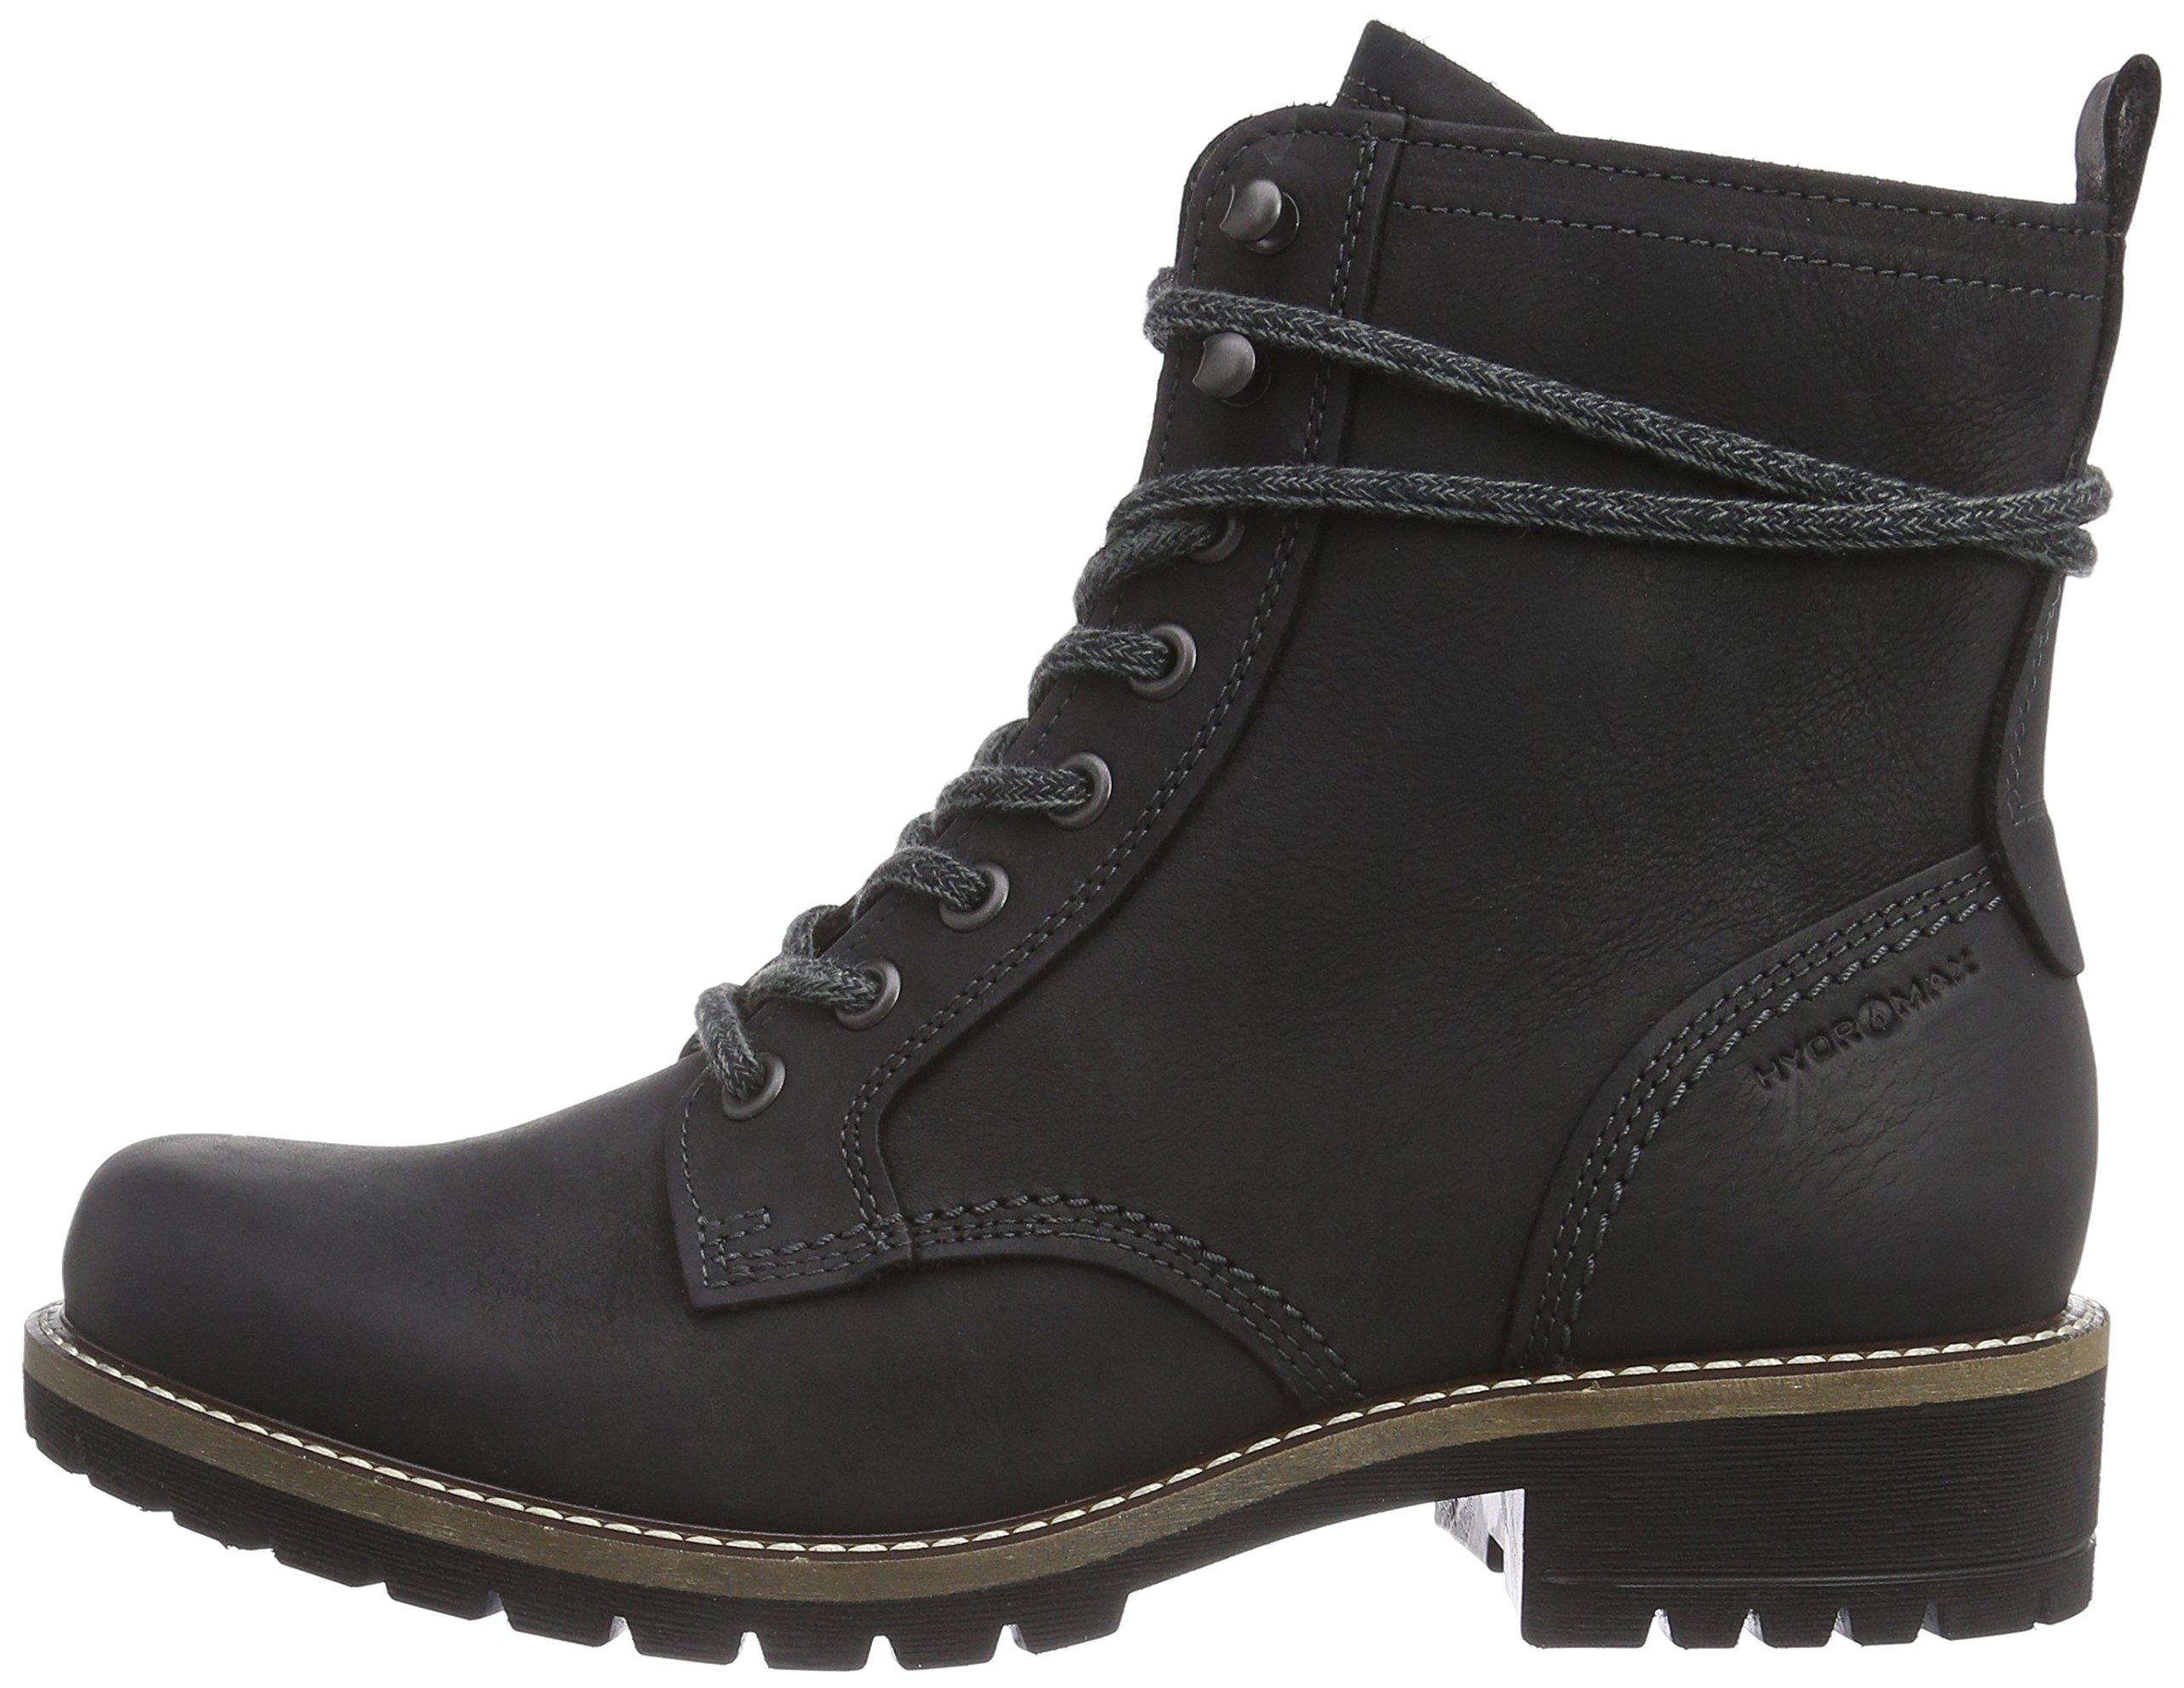 Ecco Footwear Womens Elaine Boot, Black, 37 EU/6-6.5 M US by ECCO (Image #5)